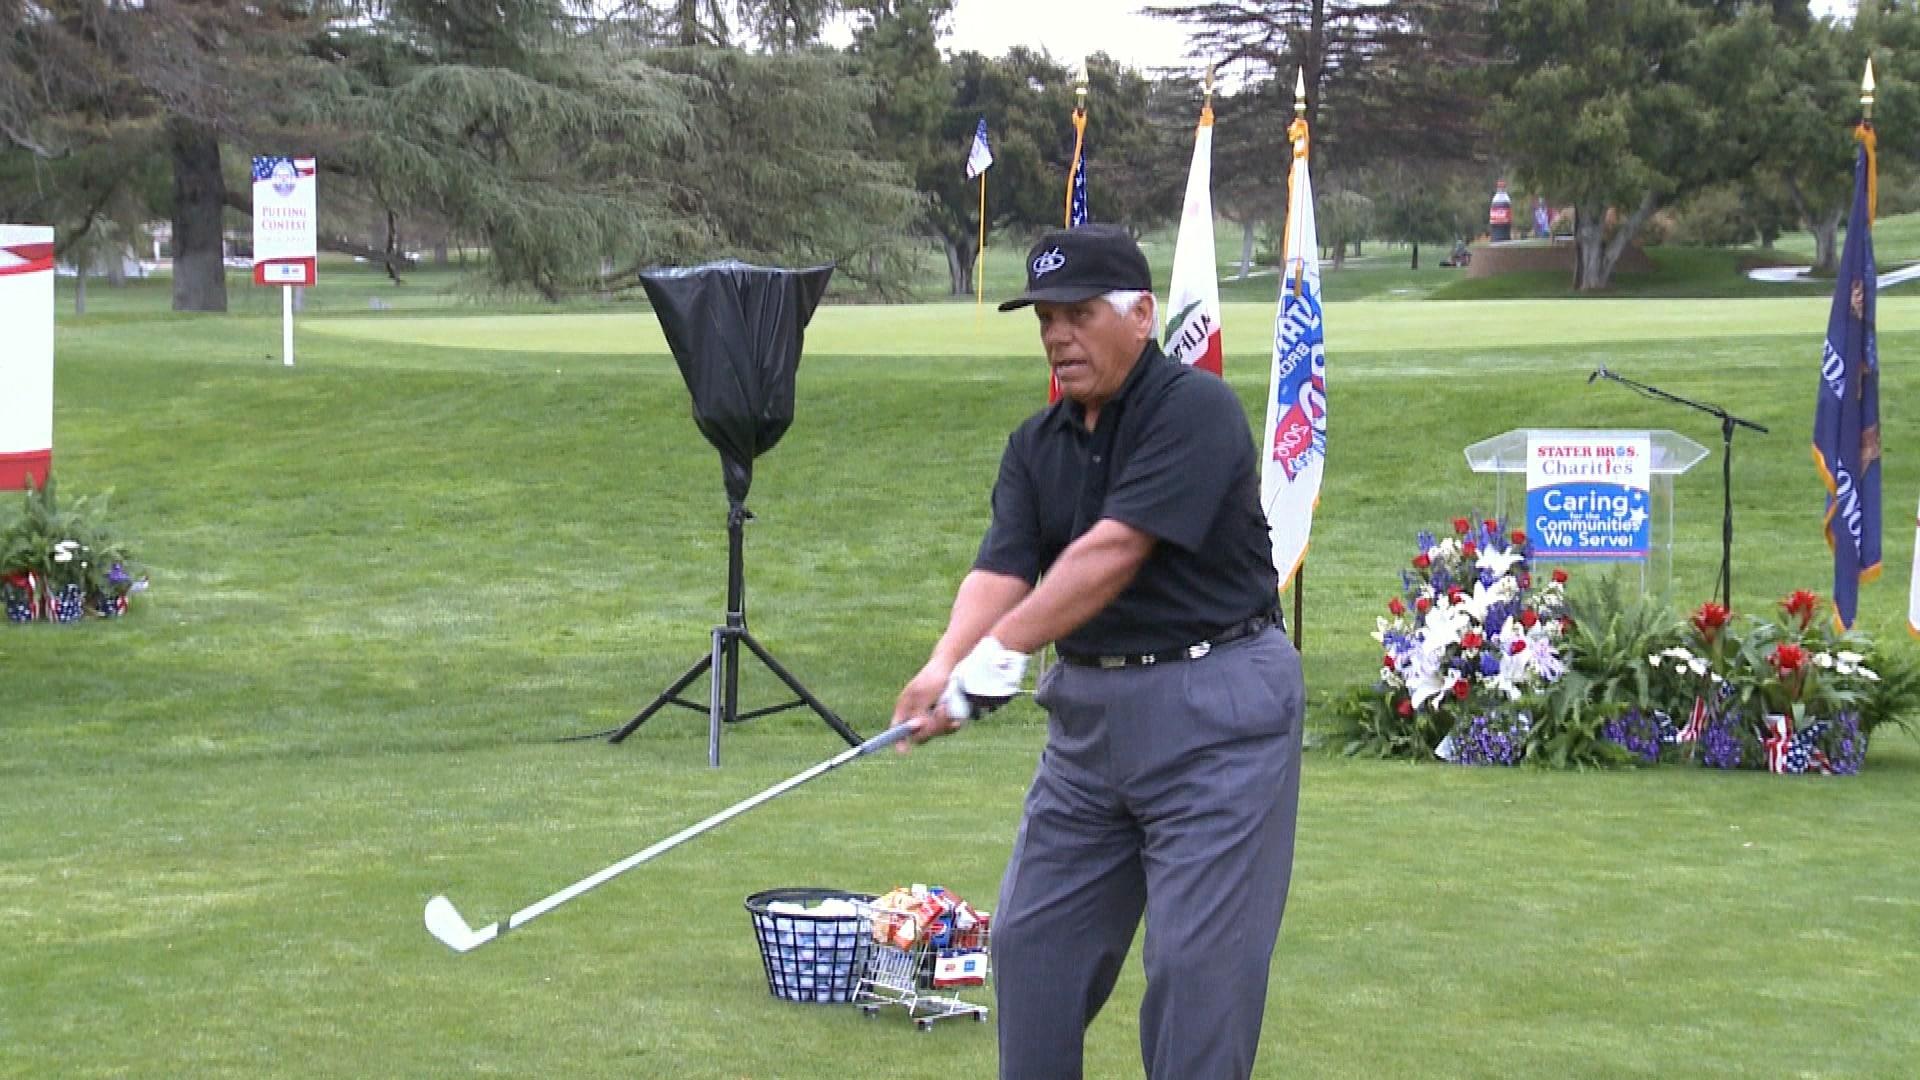 lee trevino senior golfer tips for more distance